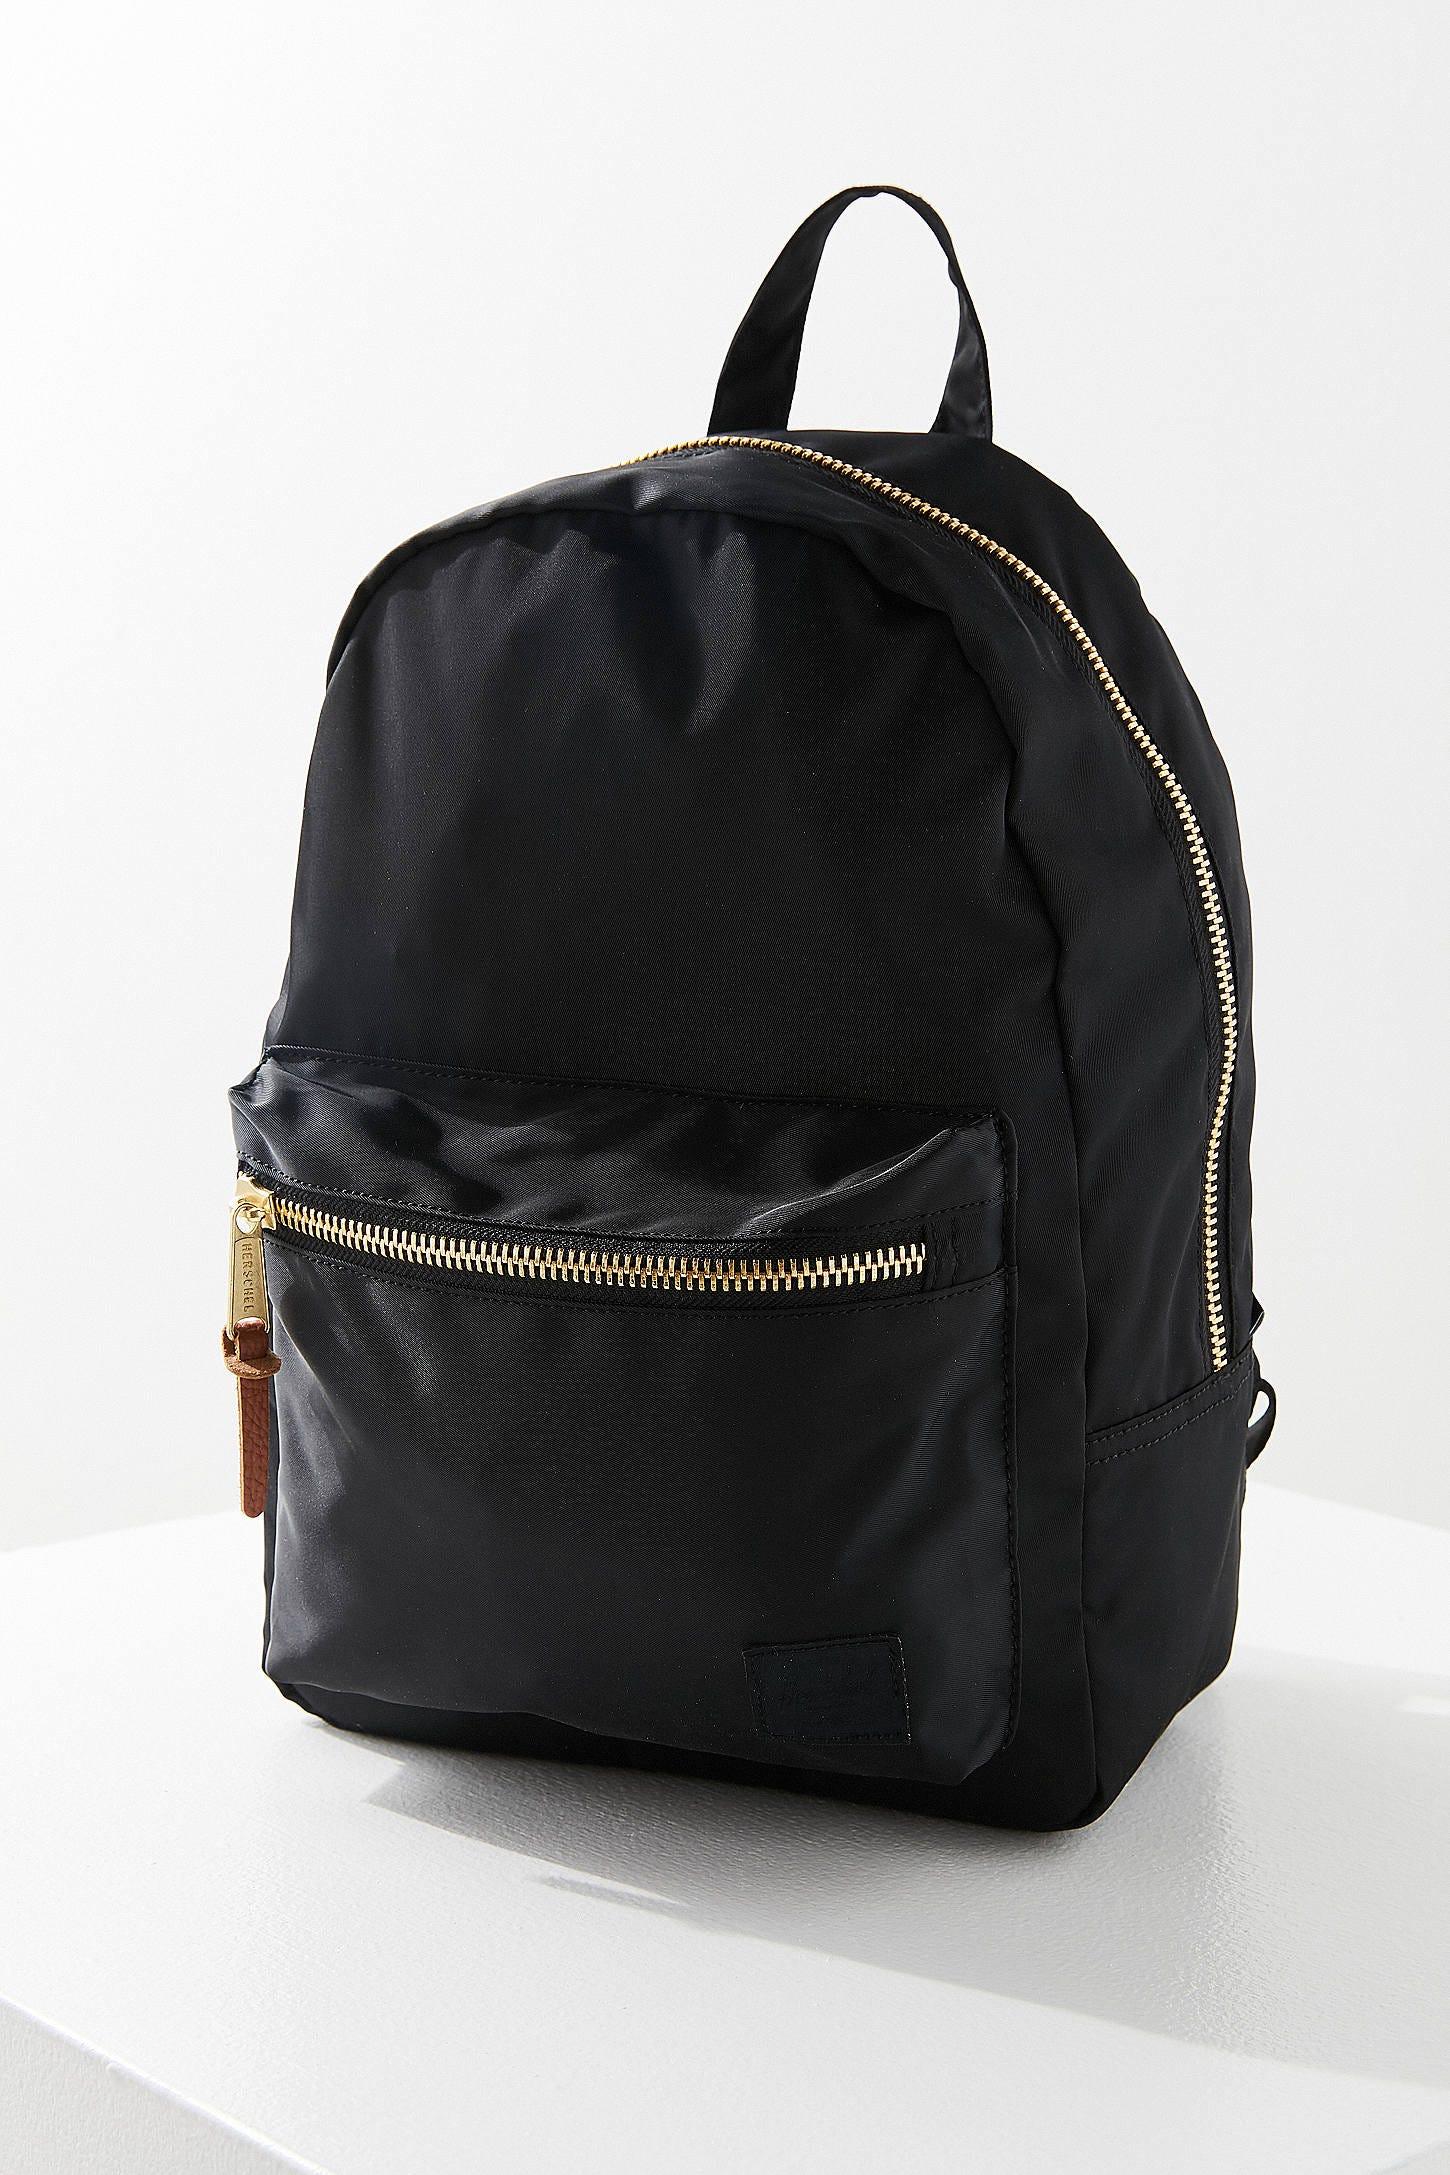 d0b863970b Black Mini Backpack Purse Target Ken Chad Consulting Ltd